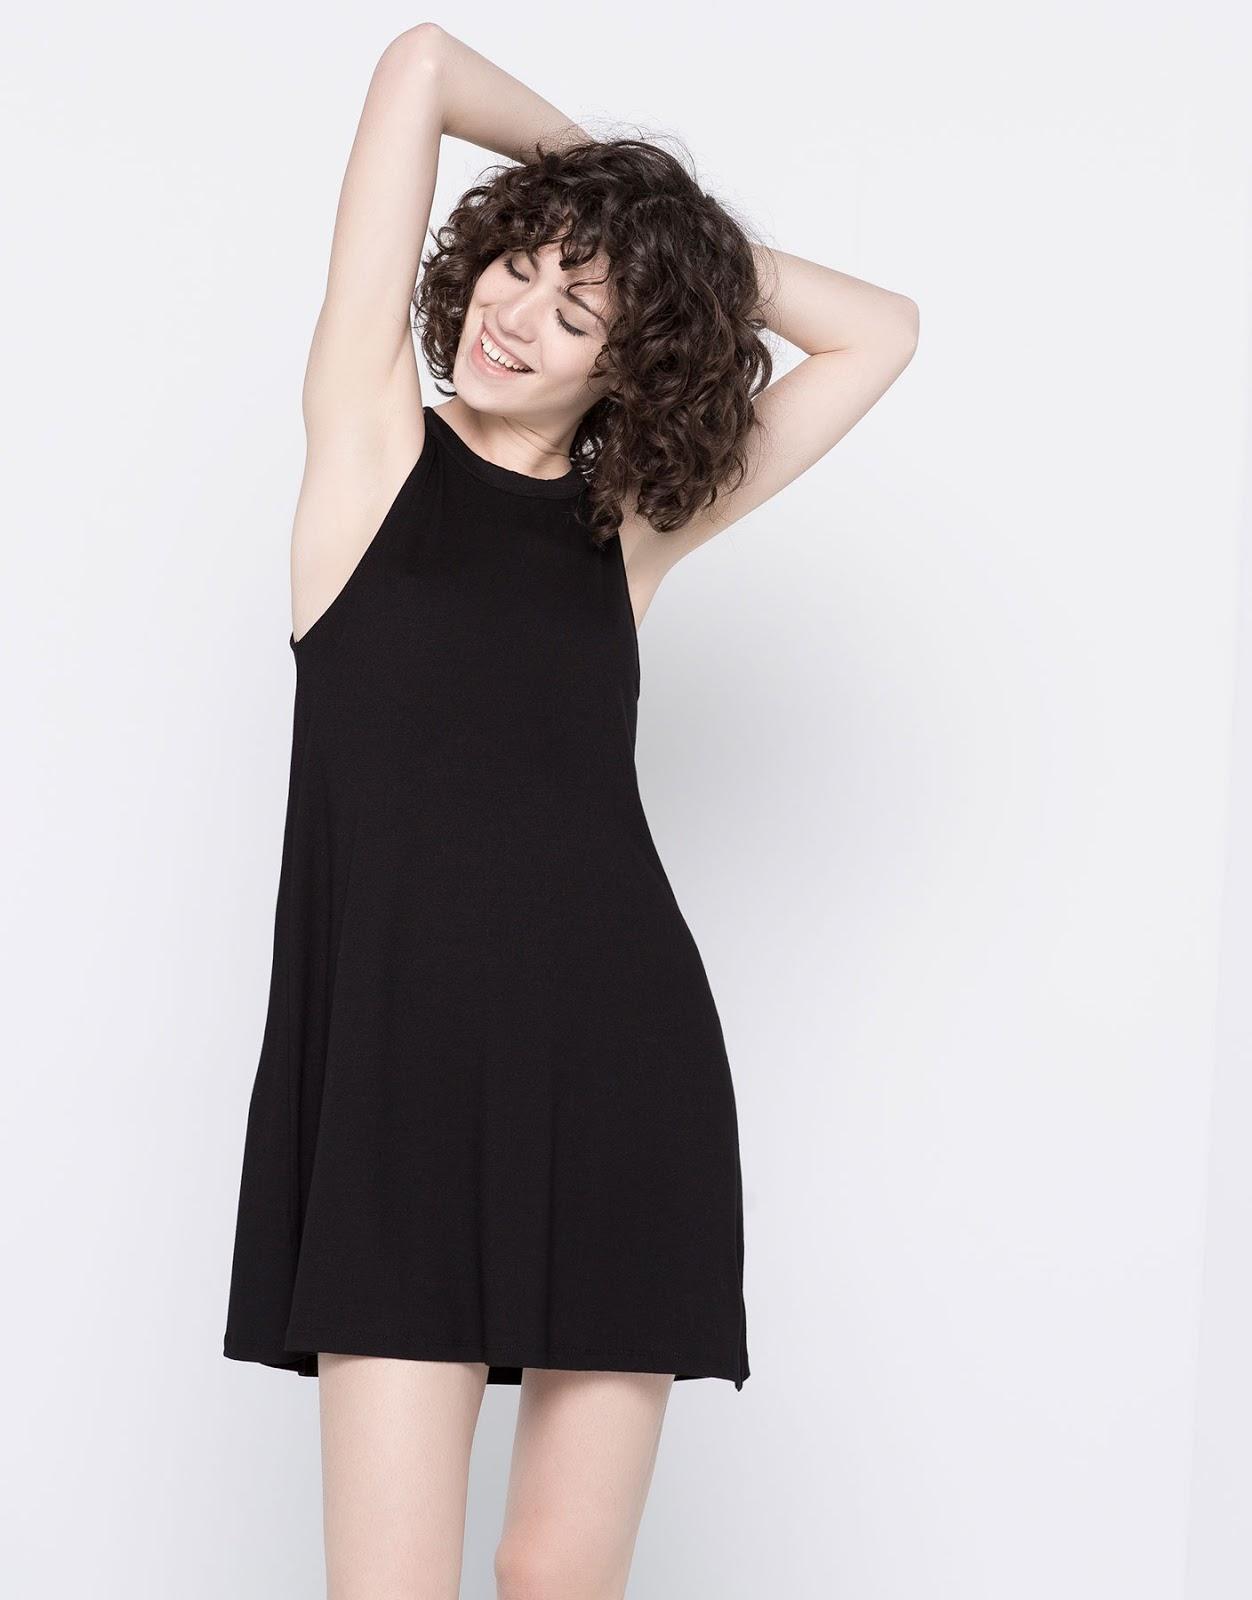 Vestido negro corto cuello halter